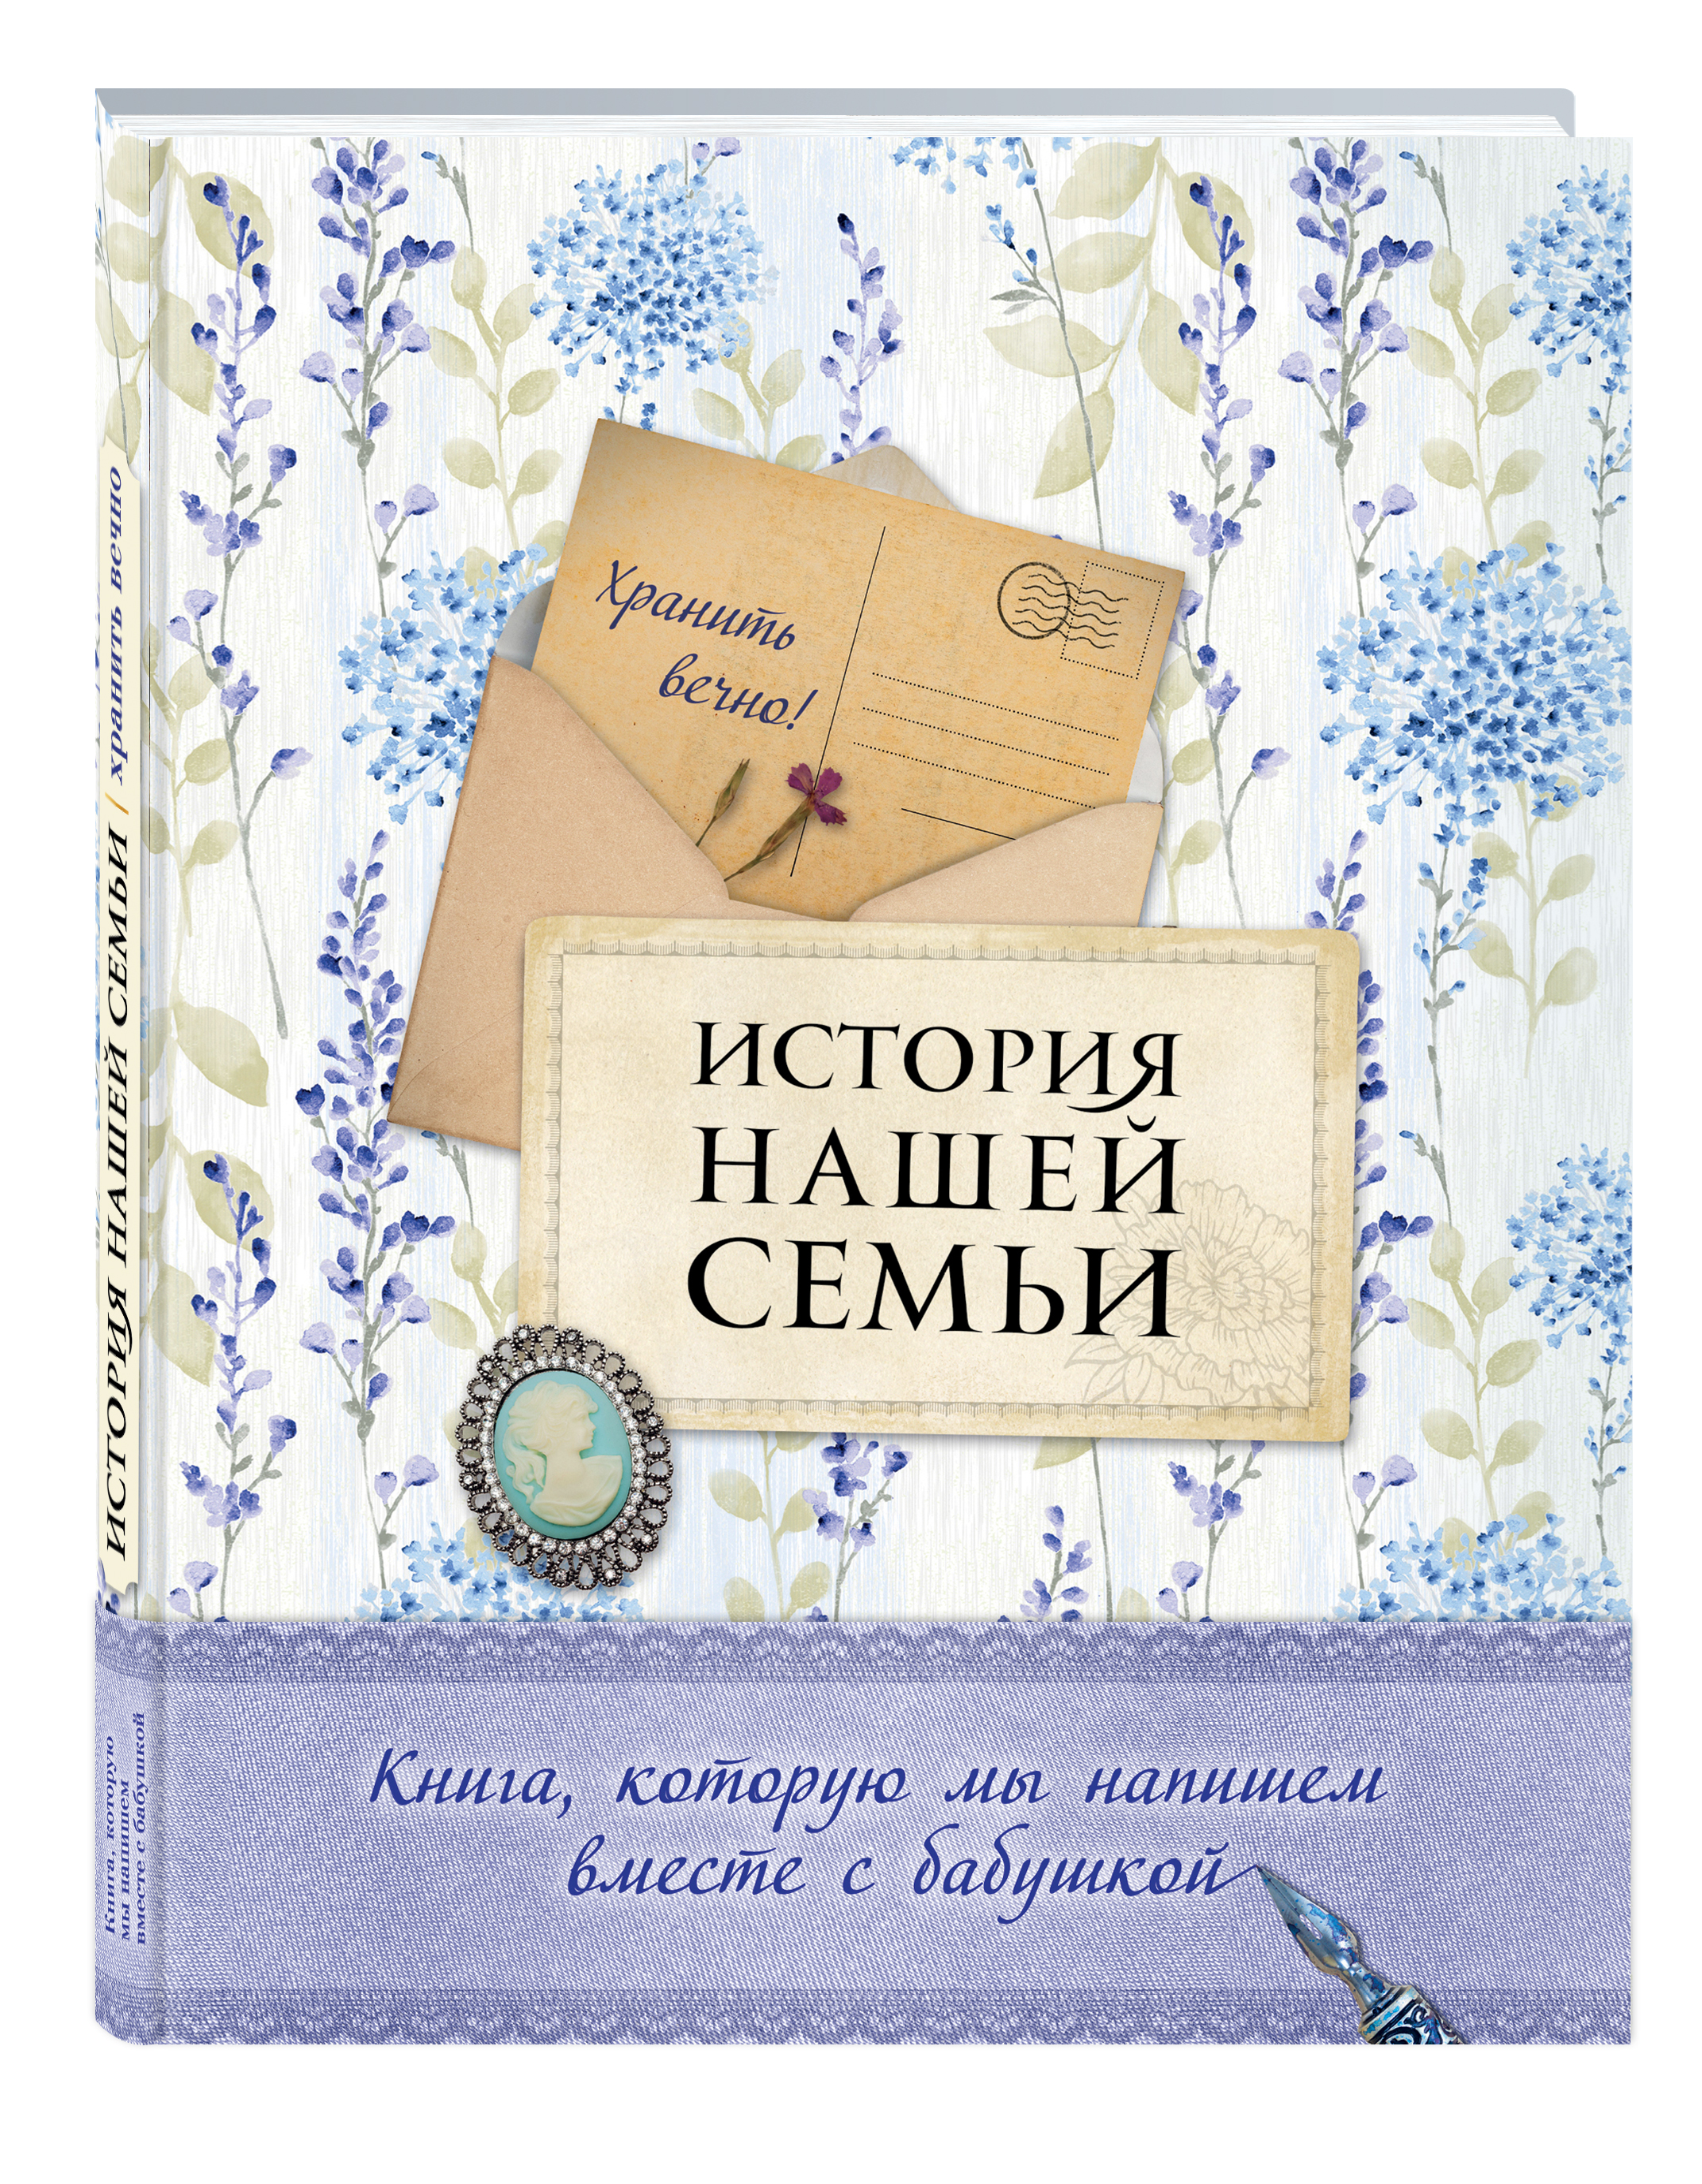 jekaterina история из жизни: